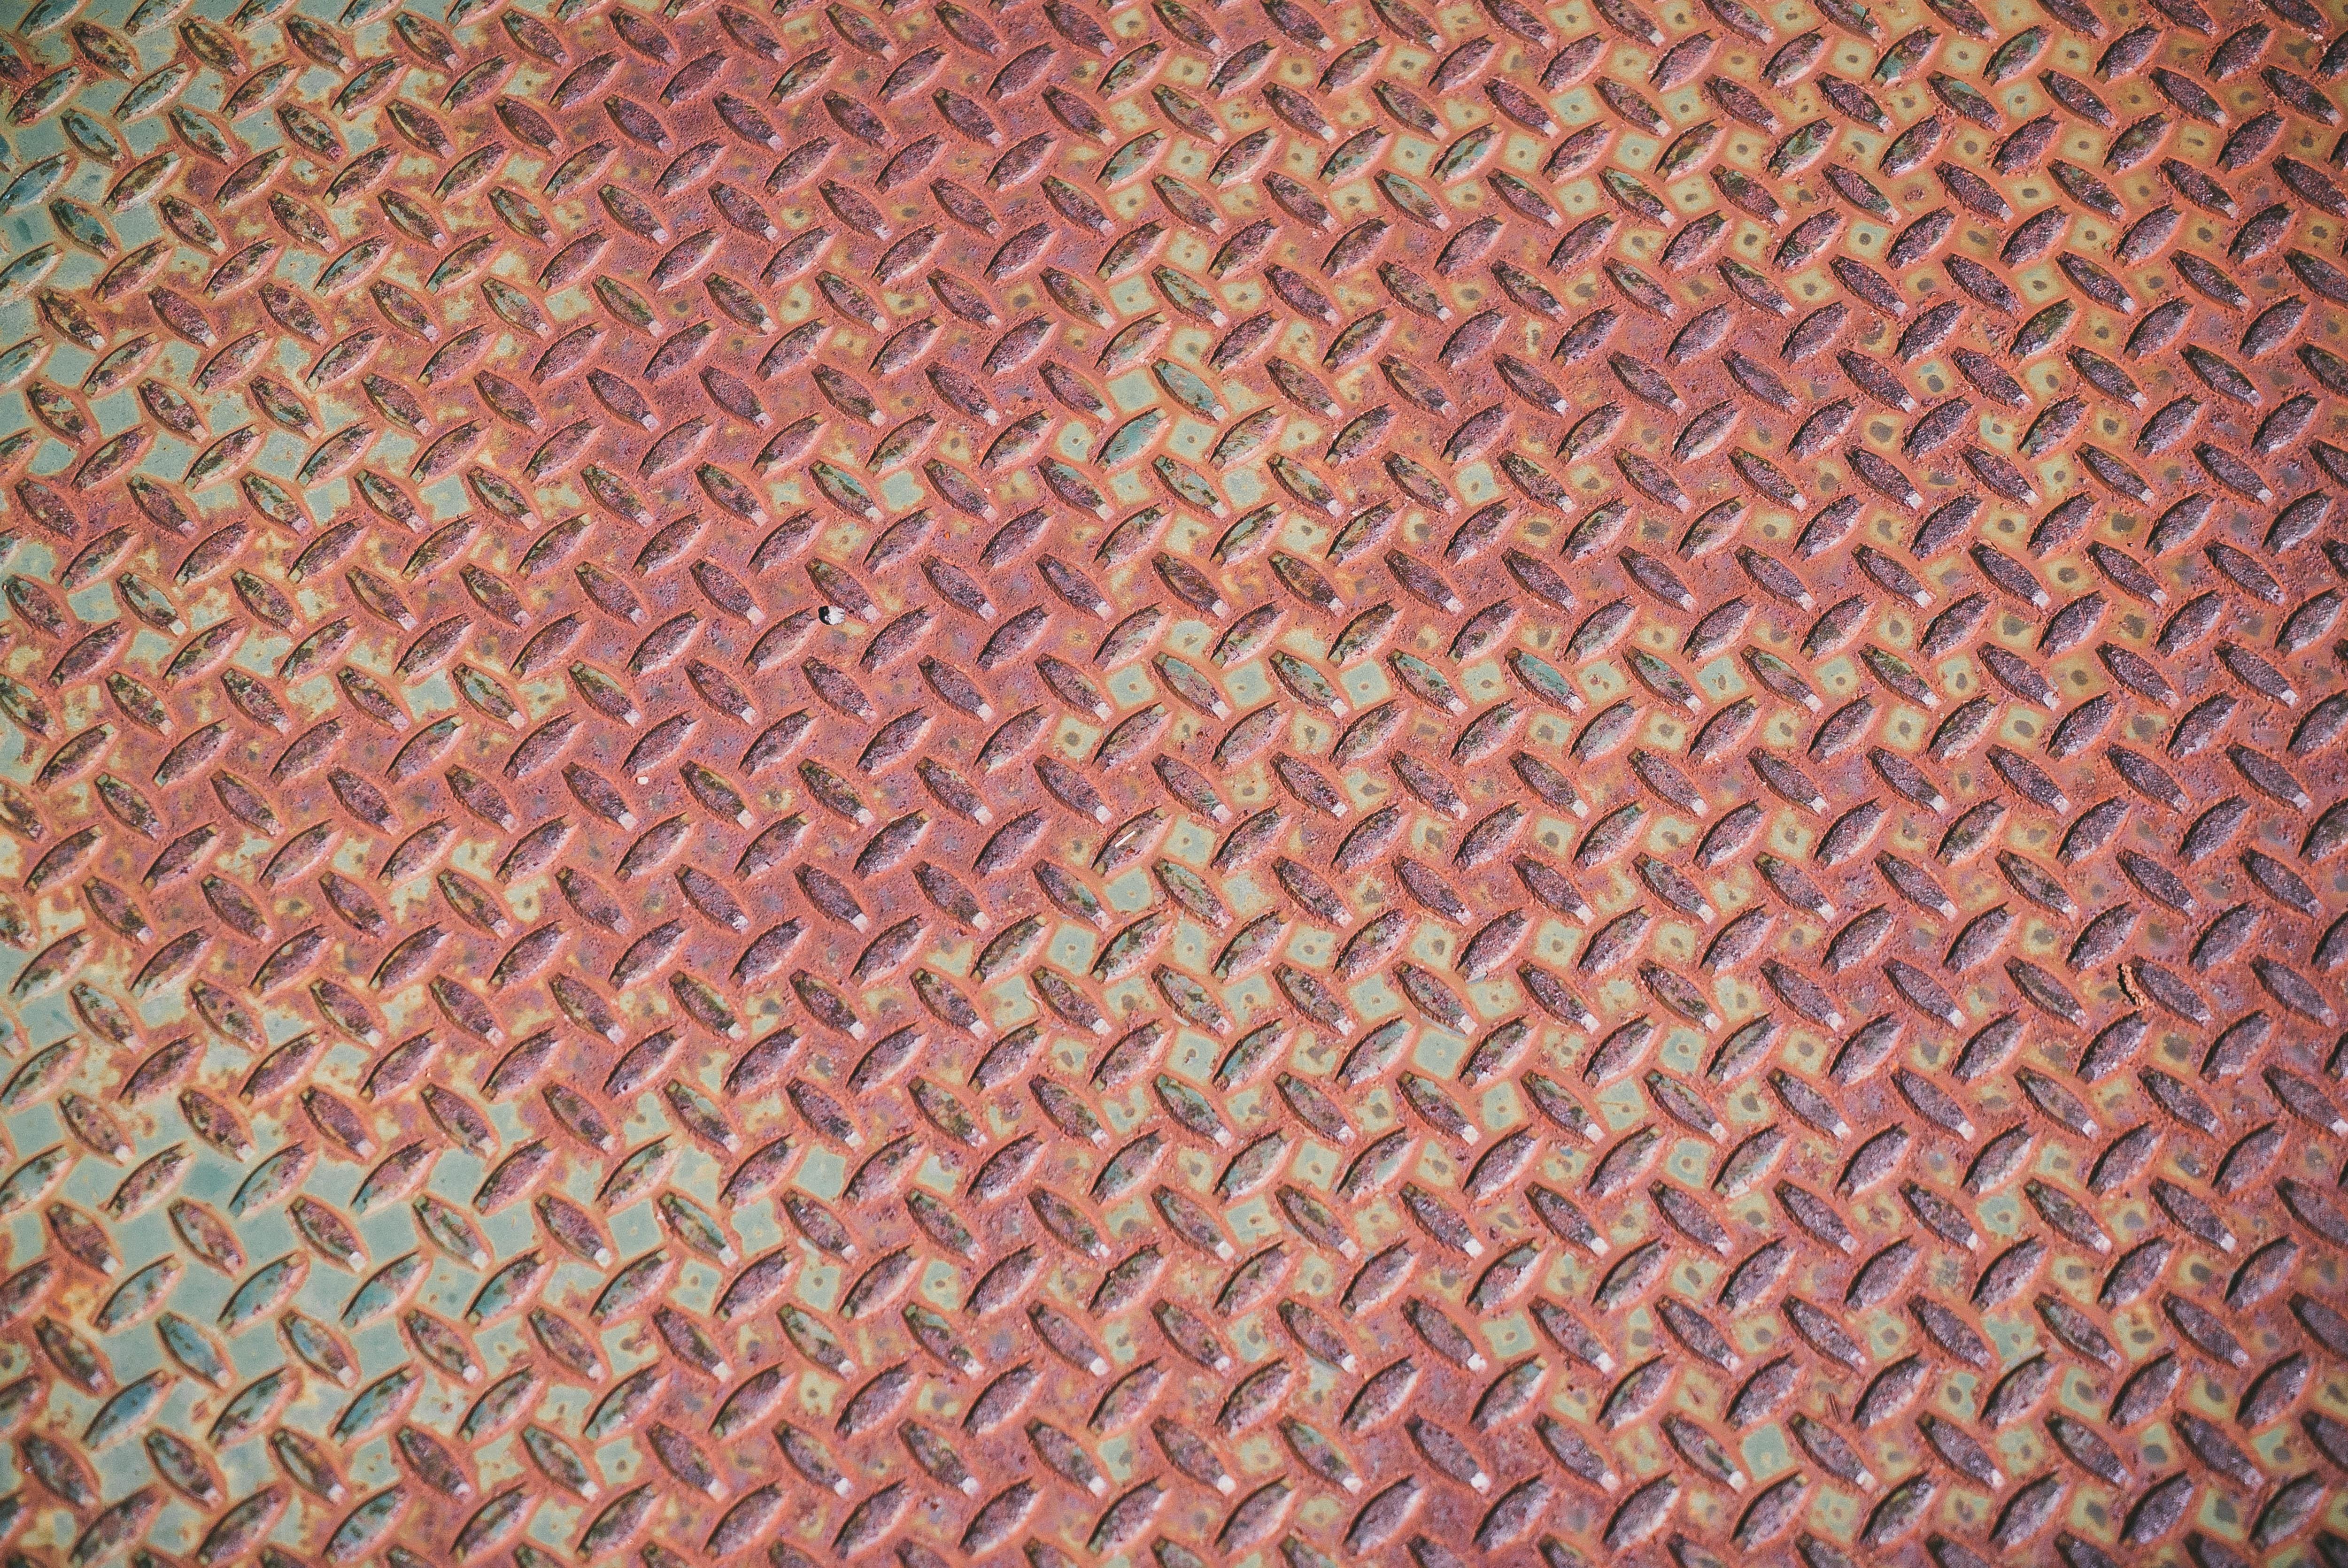 Wood Texture Floor Pattern Brown Brick Material Circle Textile Art Design Hardwood Net Carpet Flooring Laminate